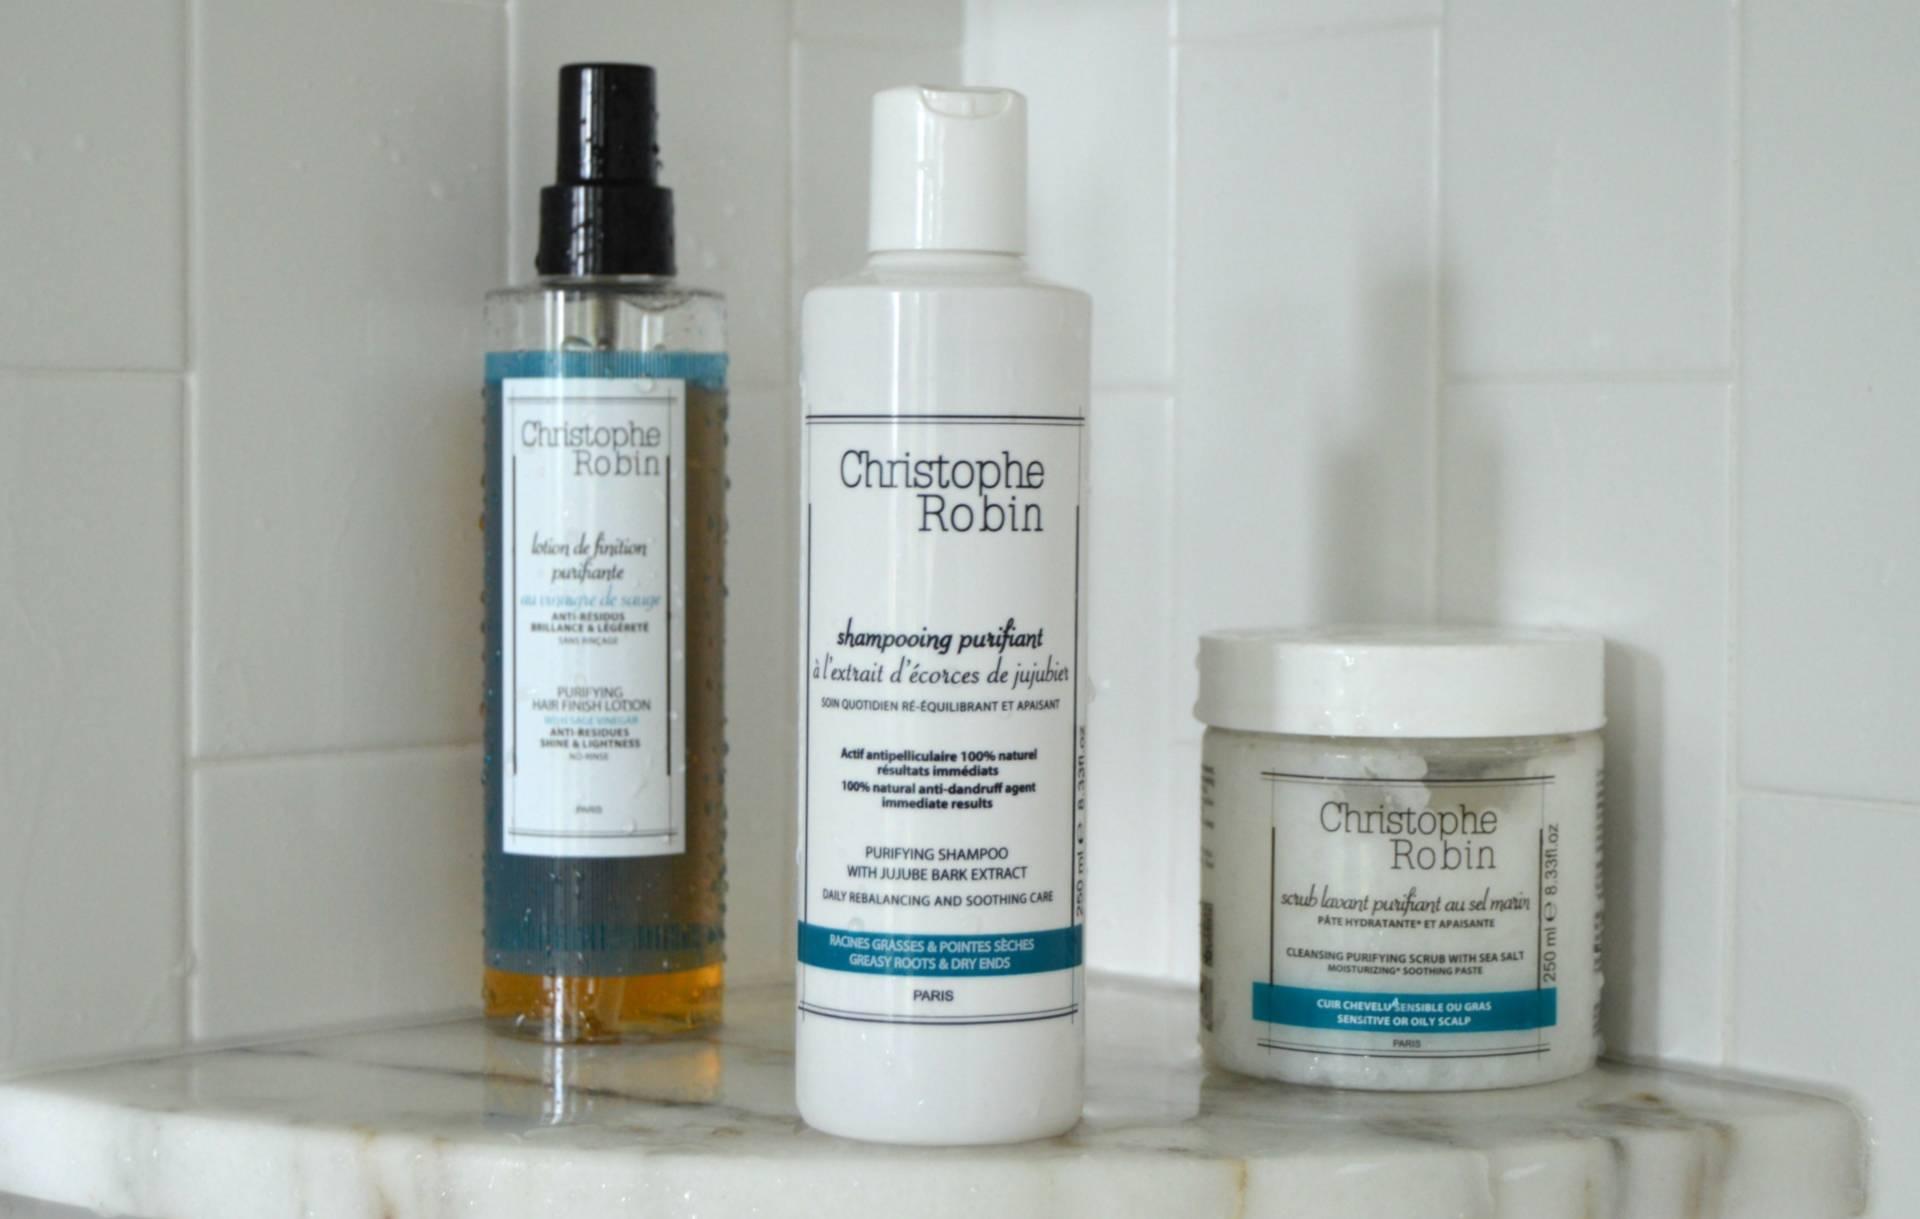 christophe-robin-purifying-shampoo-jujube-bark-extract-review-inhautepursuit